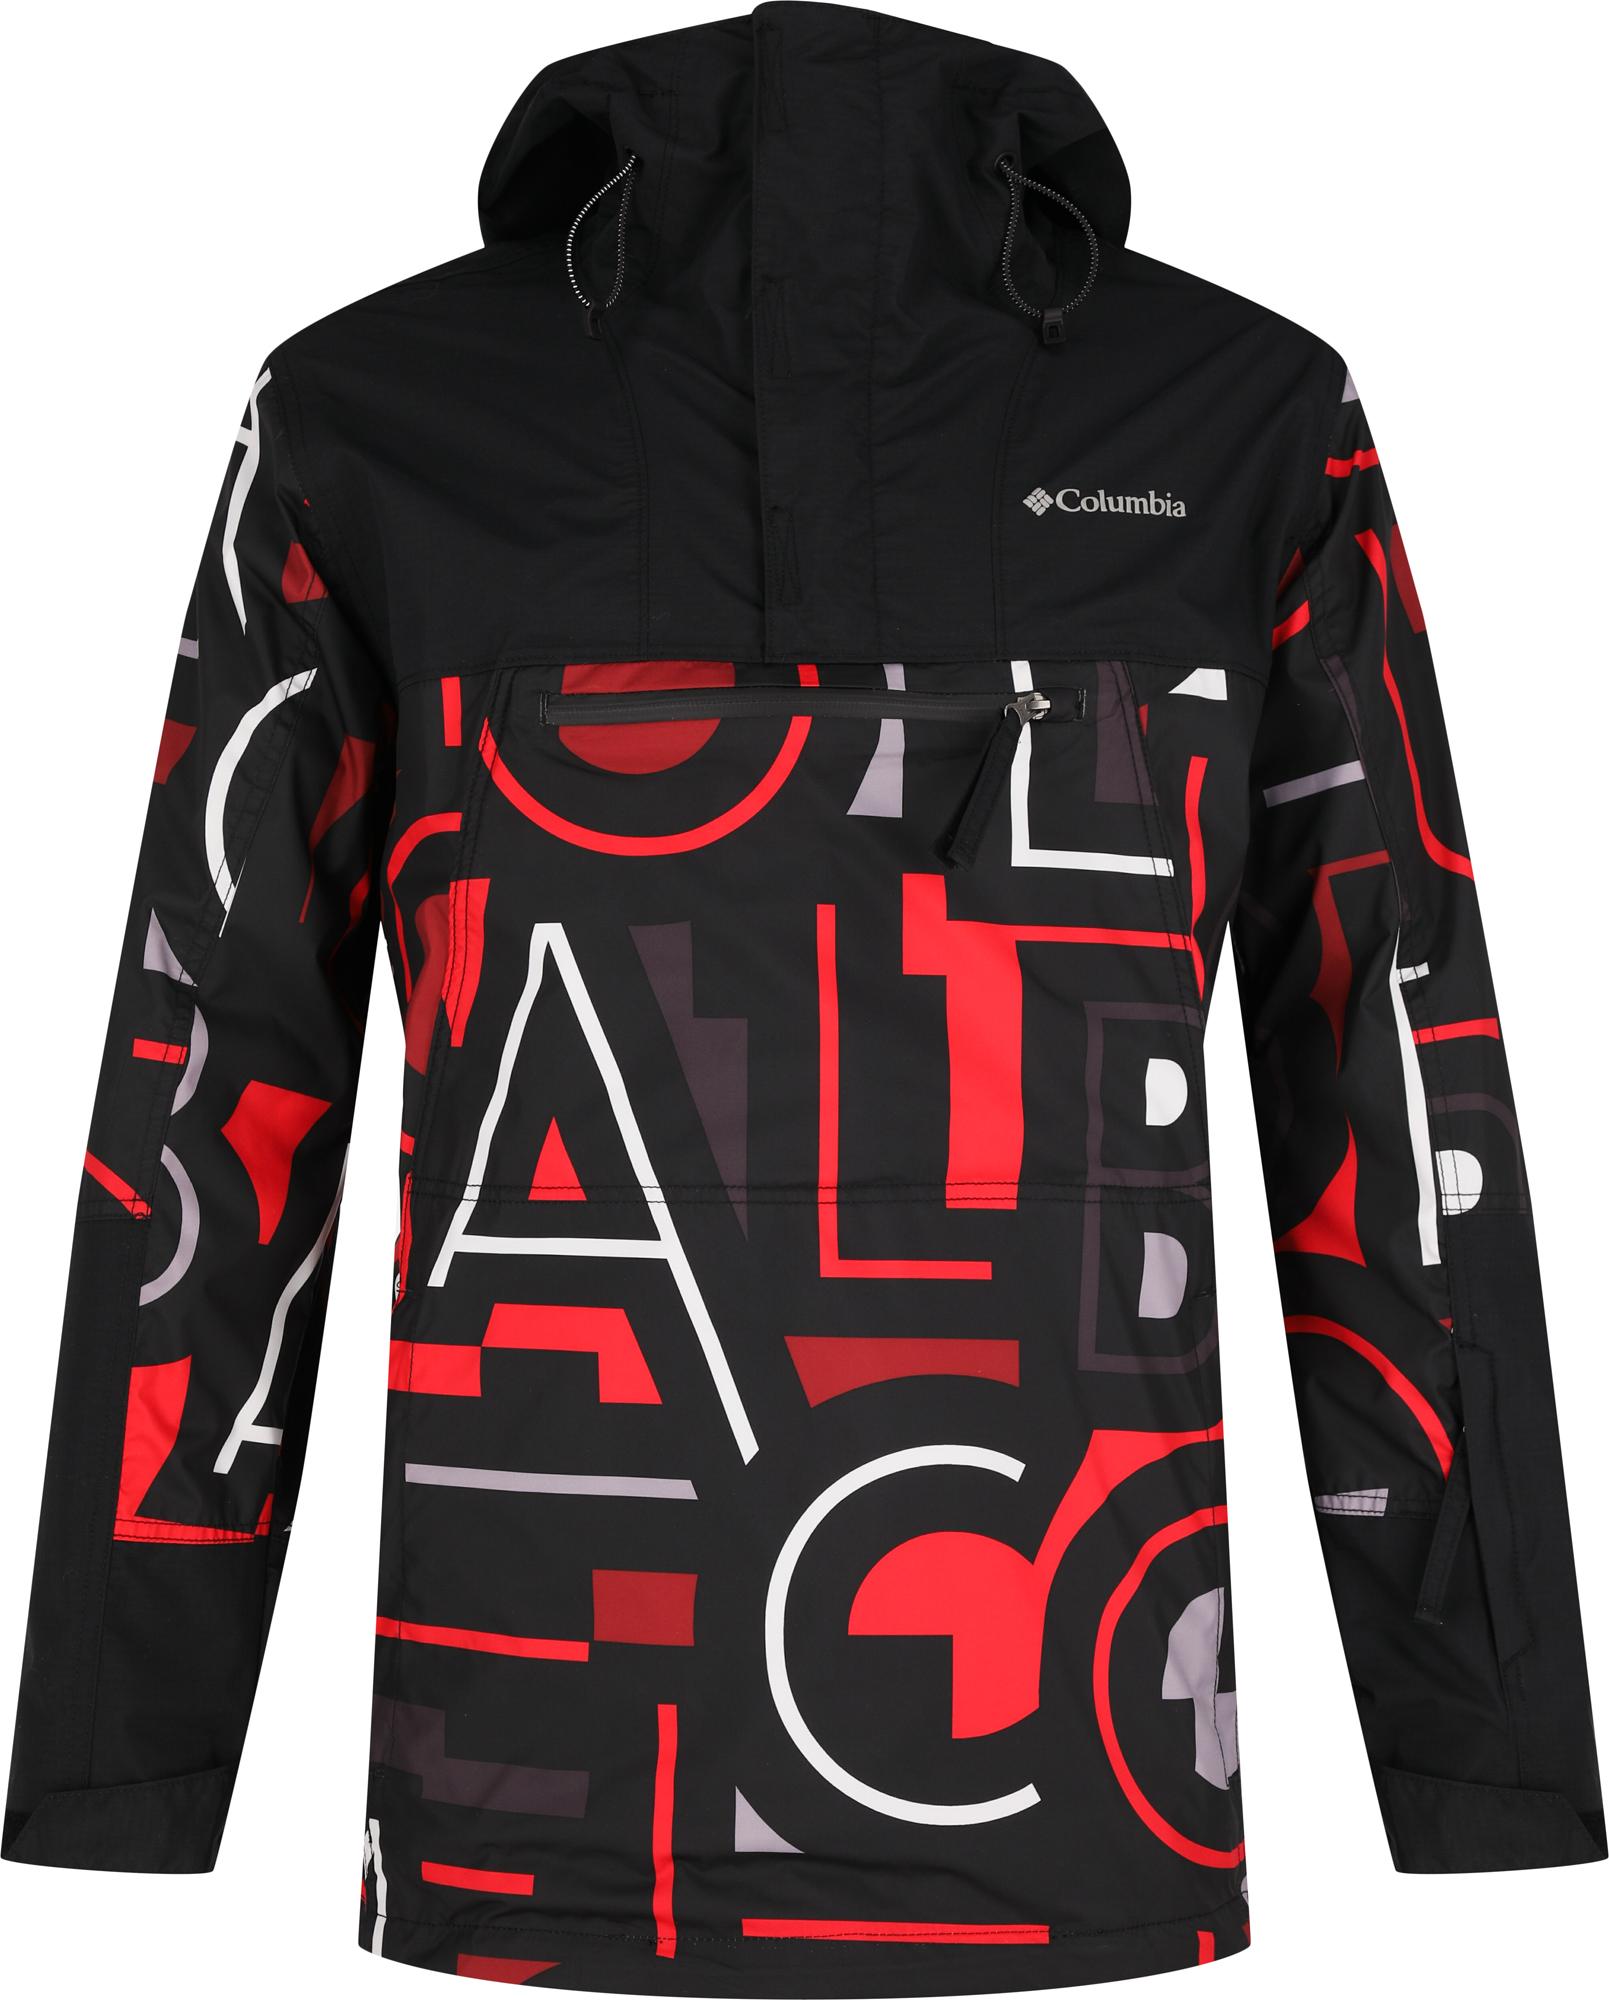 Columbia Куртка утепленная мужская Columbia Park Run™, размер 48-50 columbia куртка columbia falmouth™ размер 48 50